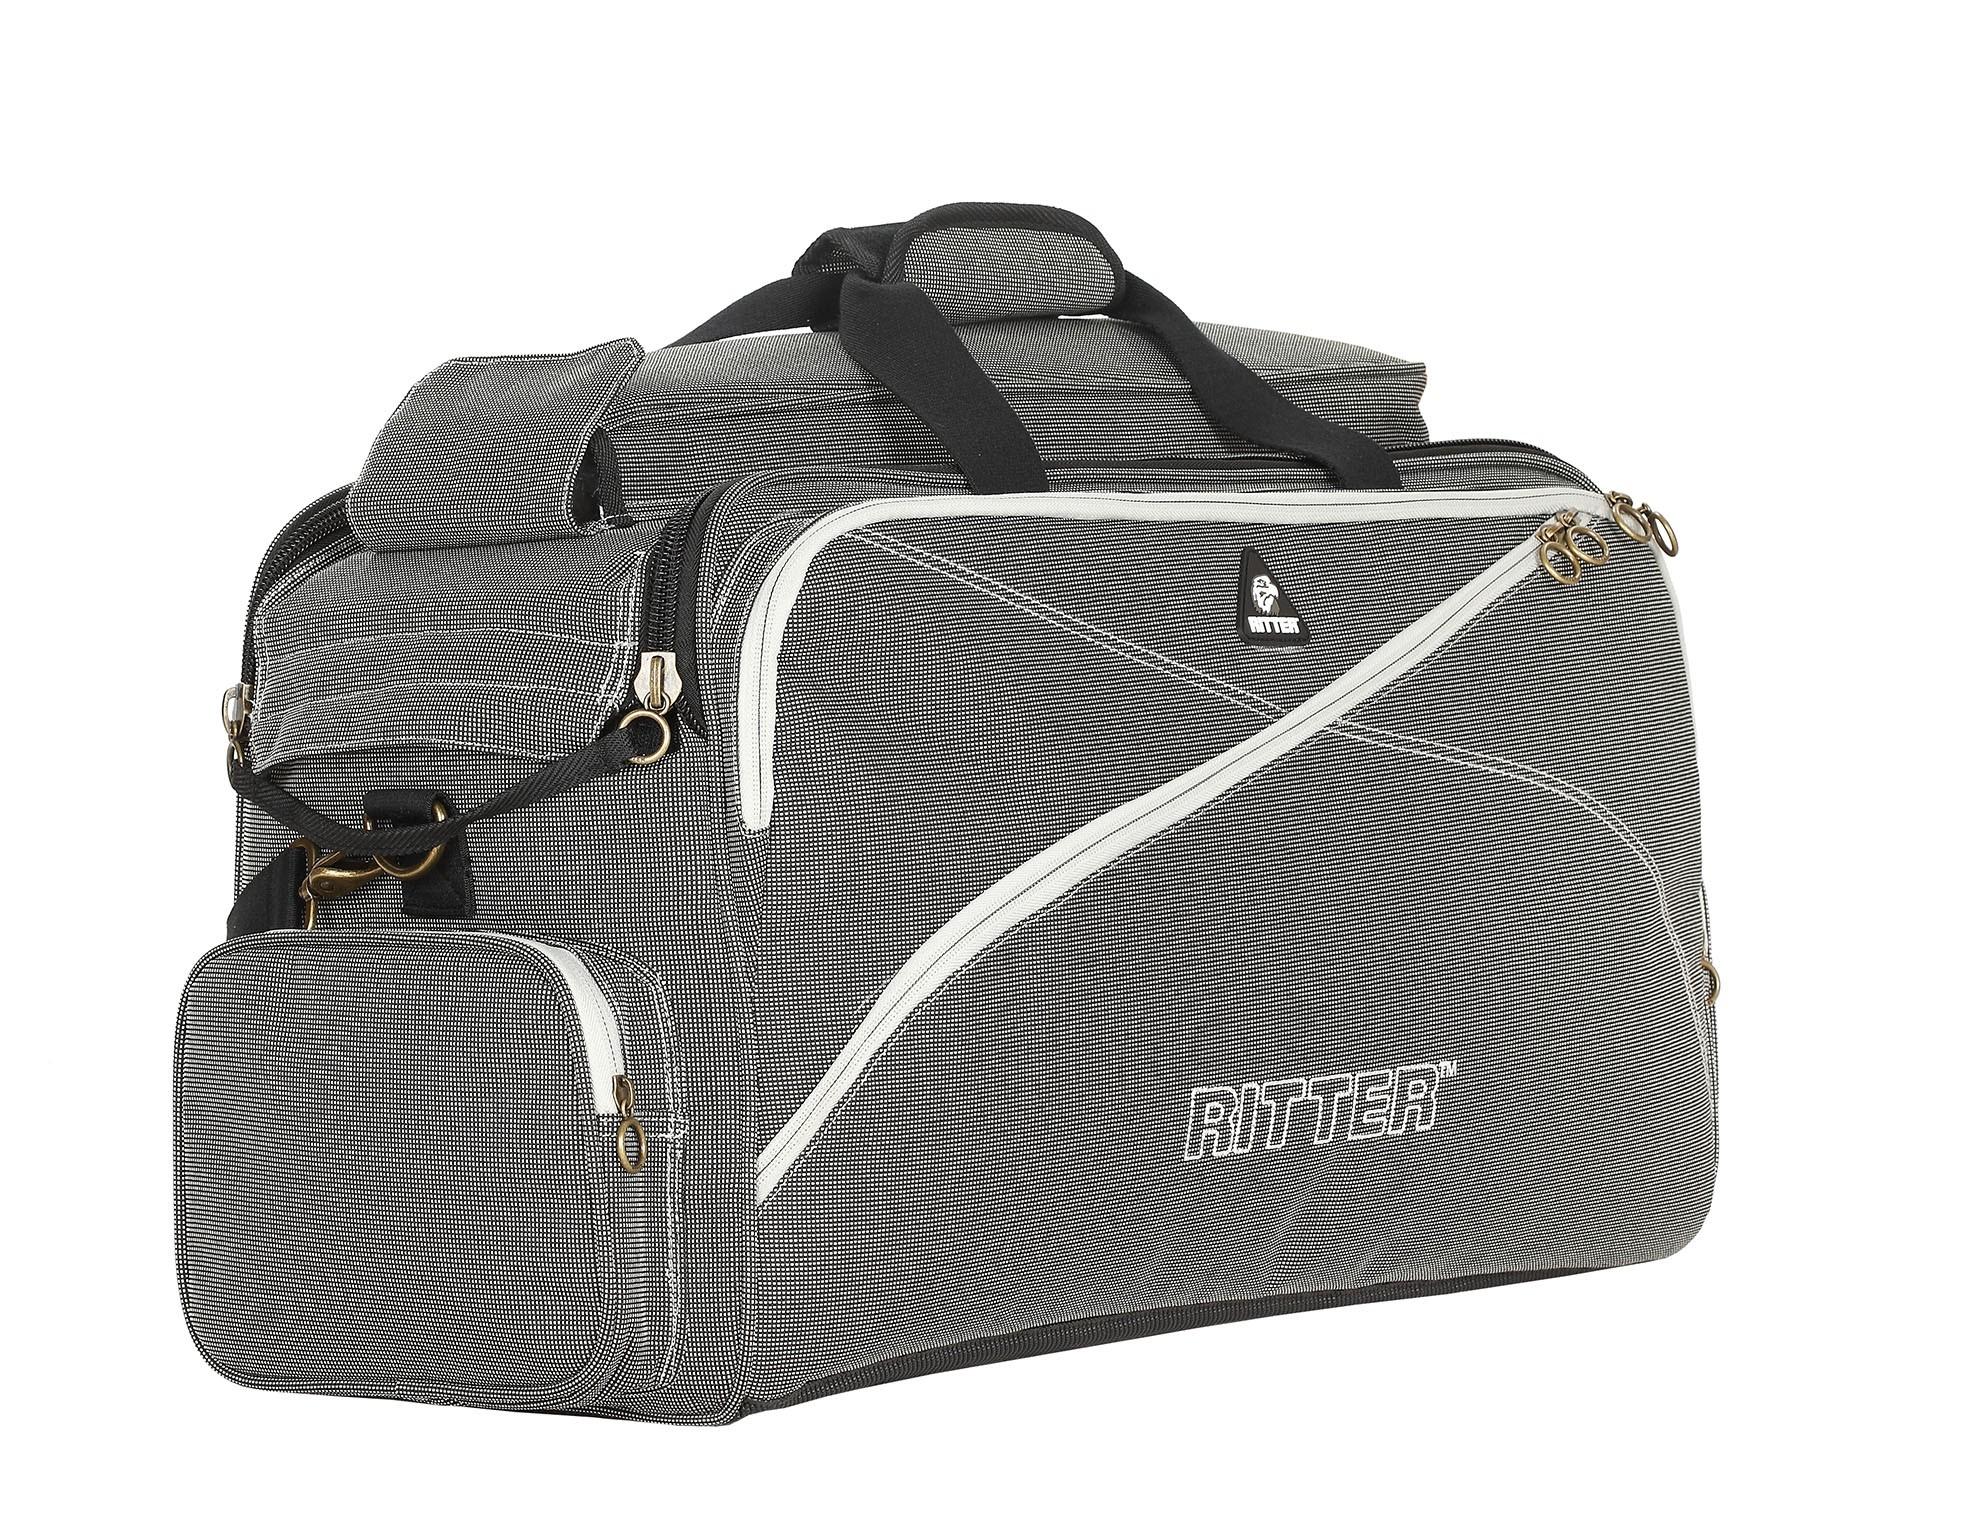 Ritter RBS7-TTR/SGL Triple Trumpet Bag - Silver Grey/Moon